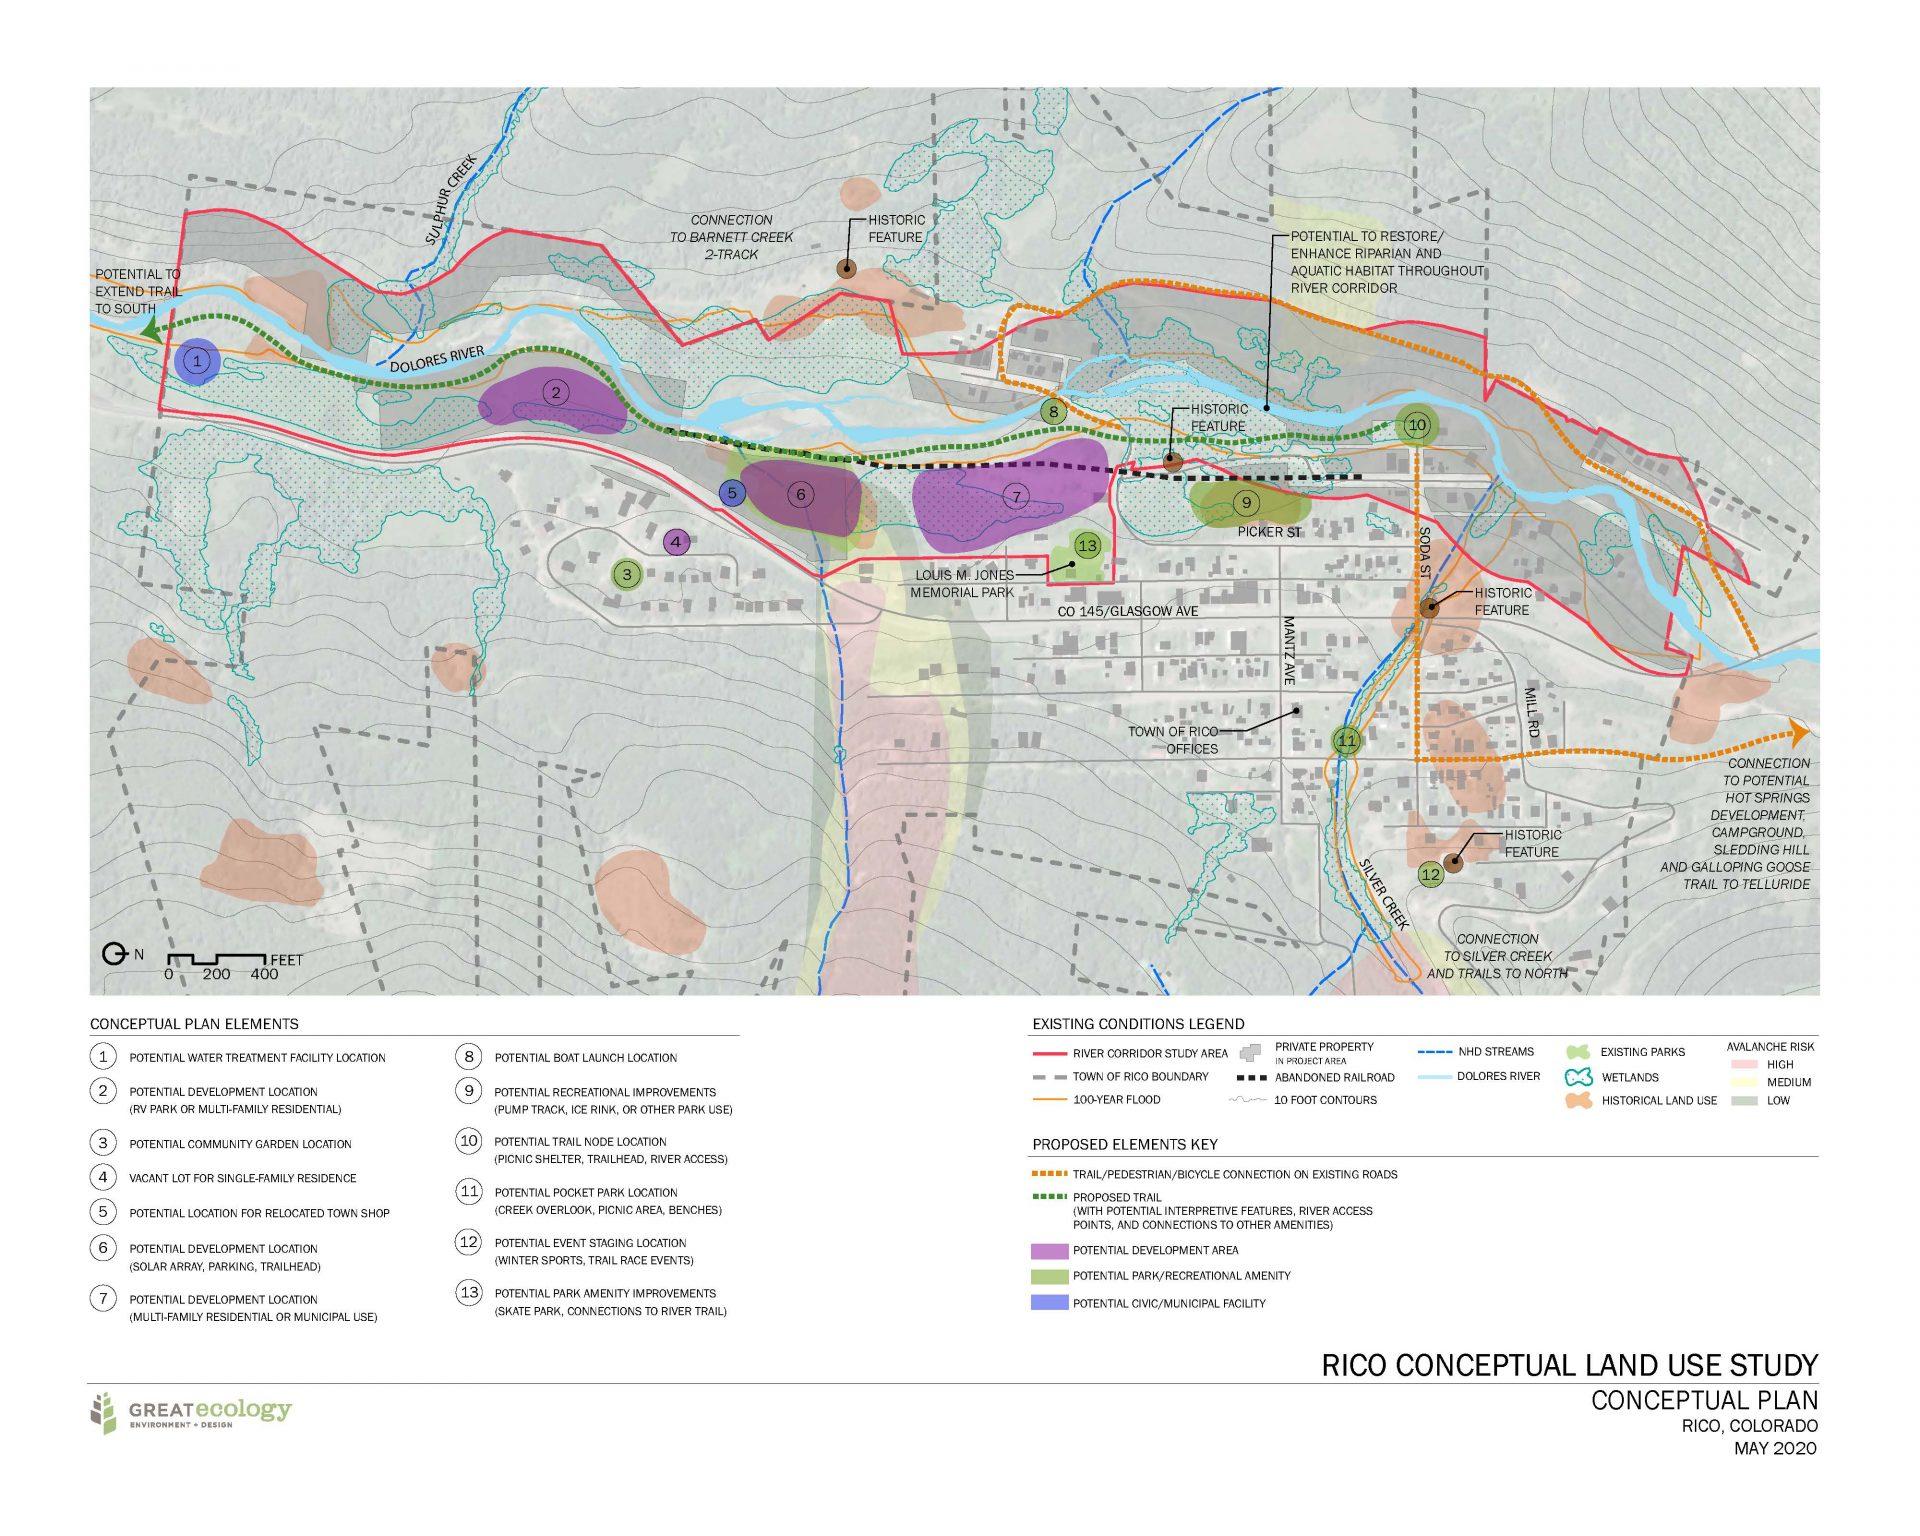 Town of Rico Conceptual Land Use Plan